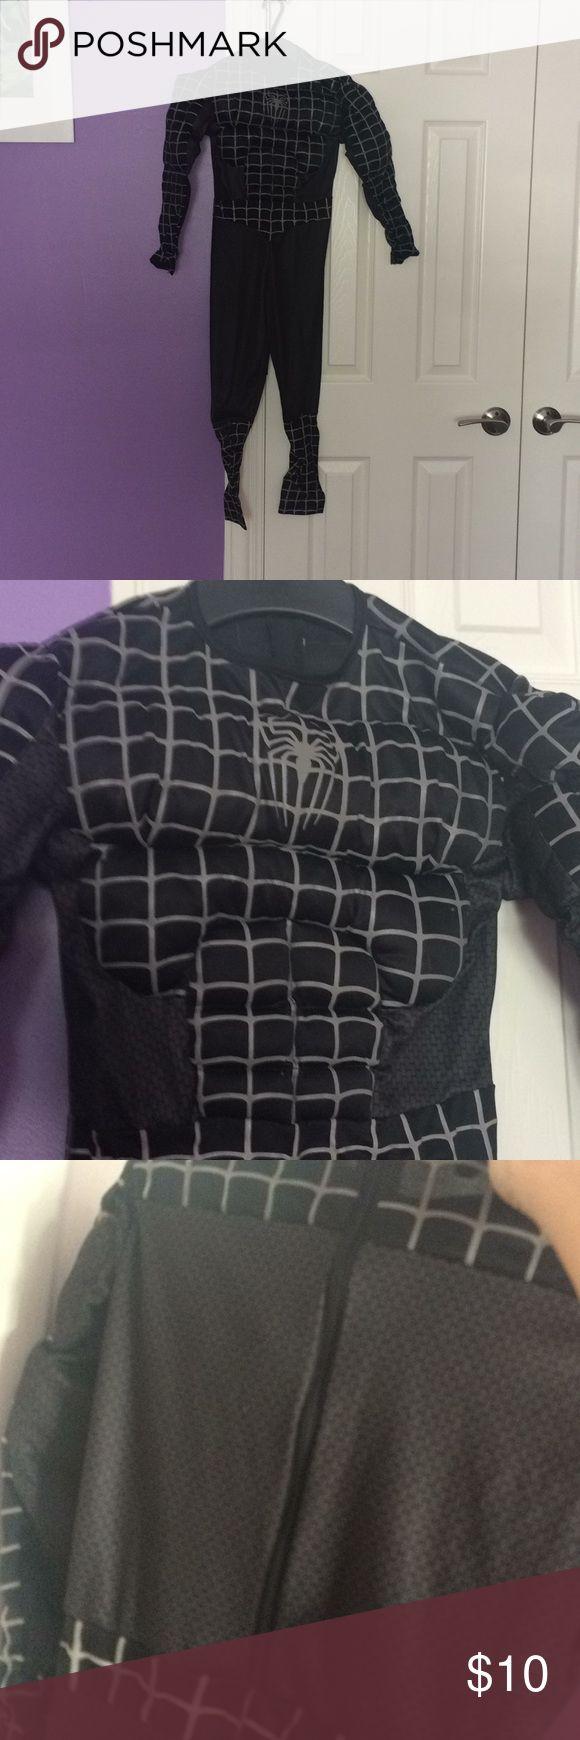 boys black Spiderman Halloween costume boys black Halloween Spiderman costume with fake muscles size 8 Costumes Superhero